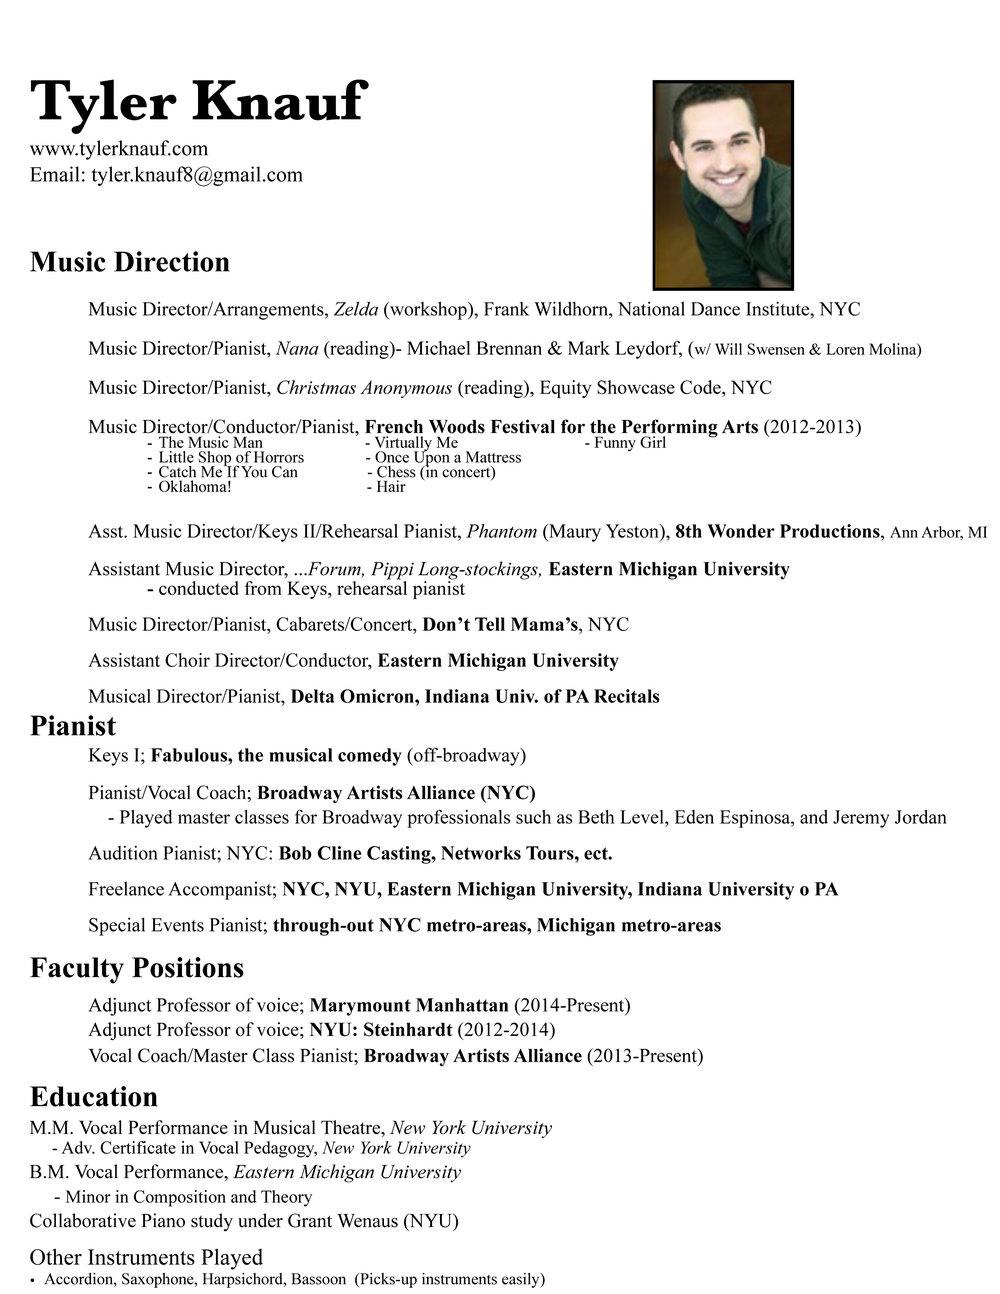 Music Director Pianist Tyler Knauf